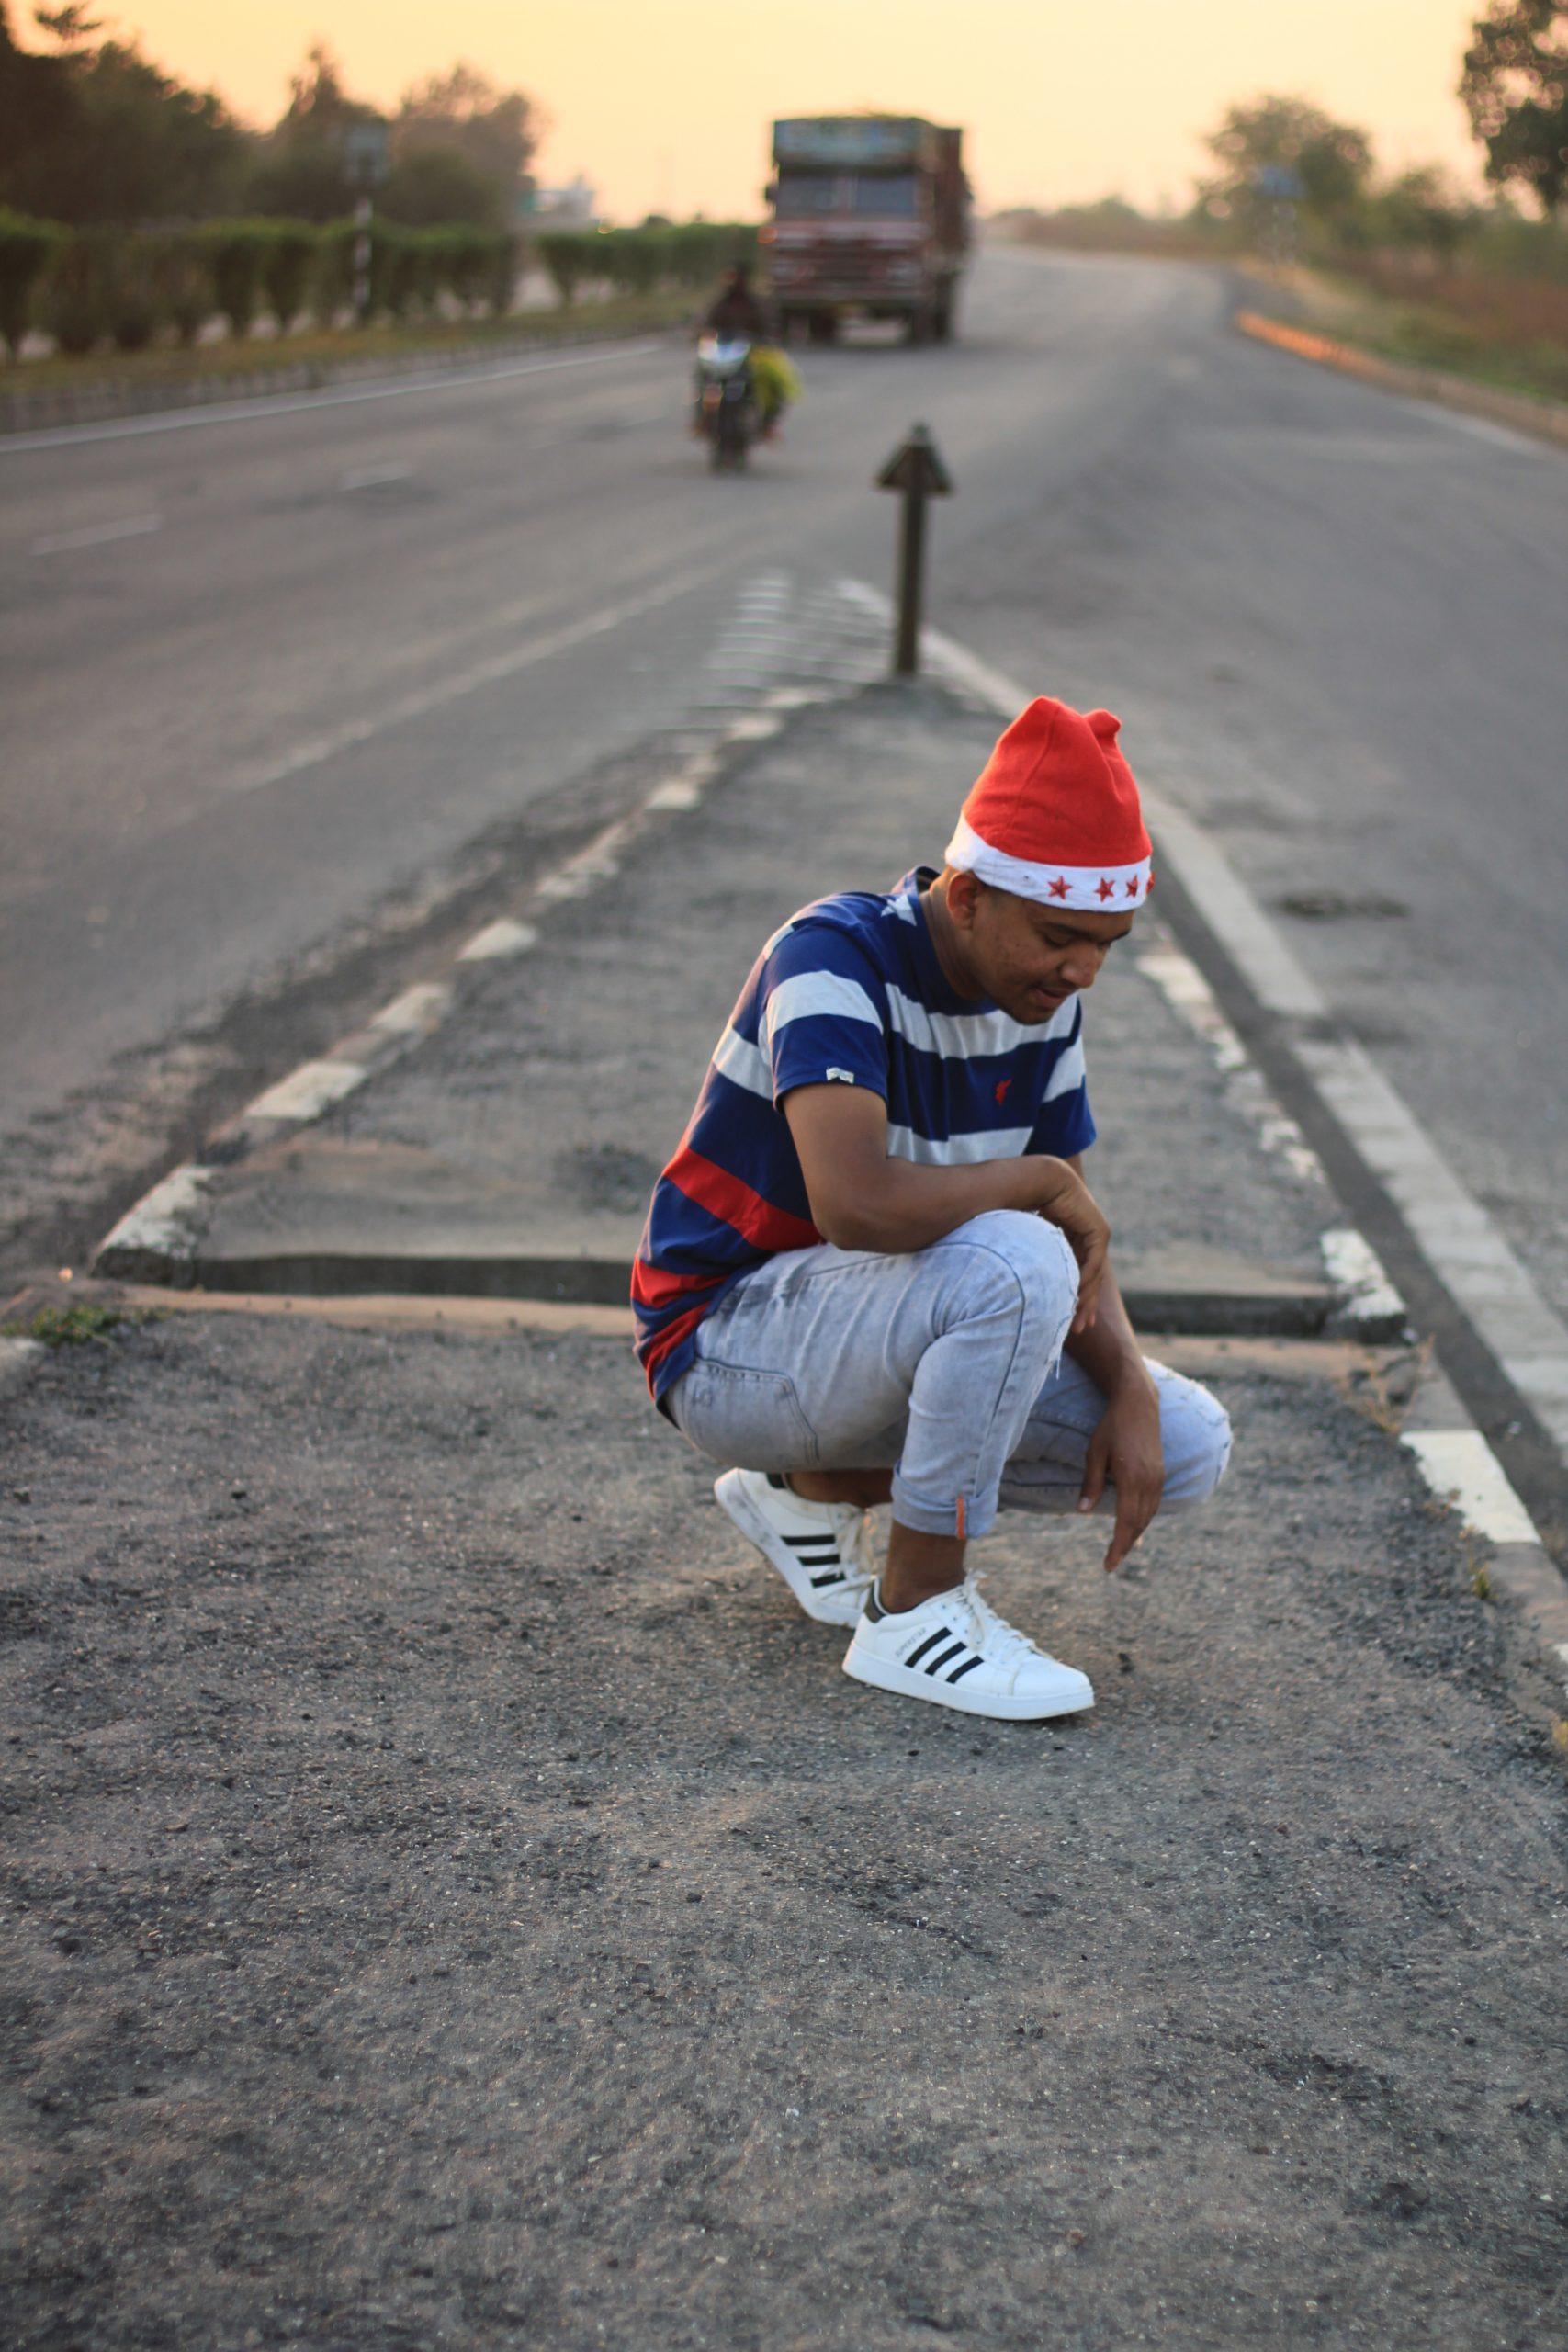 A sad boy on a road